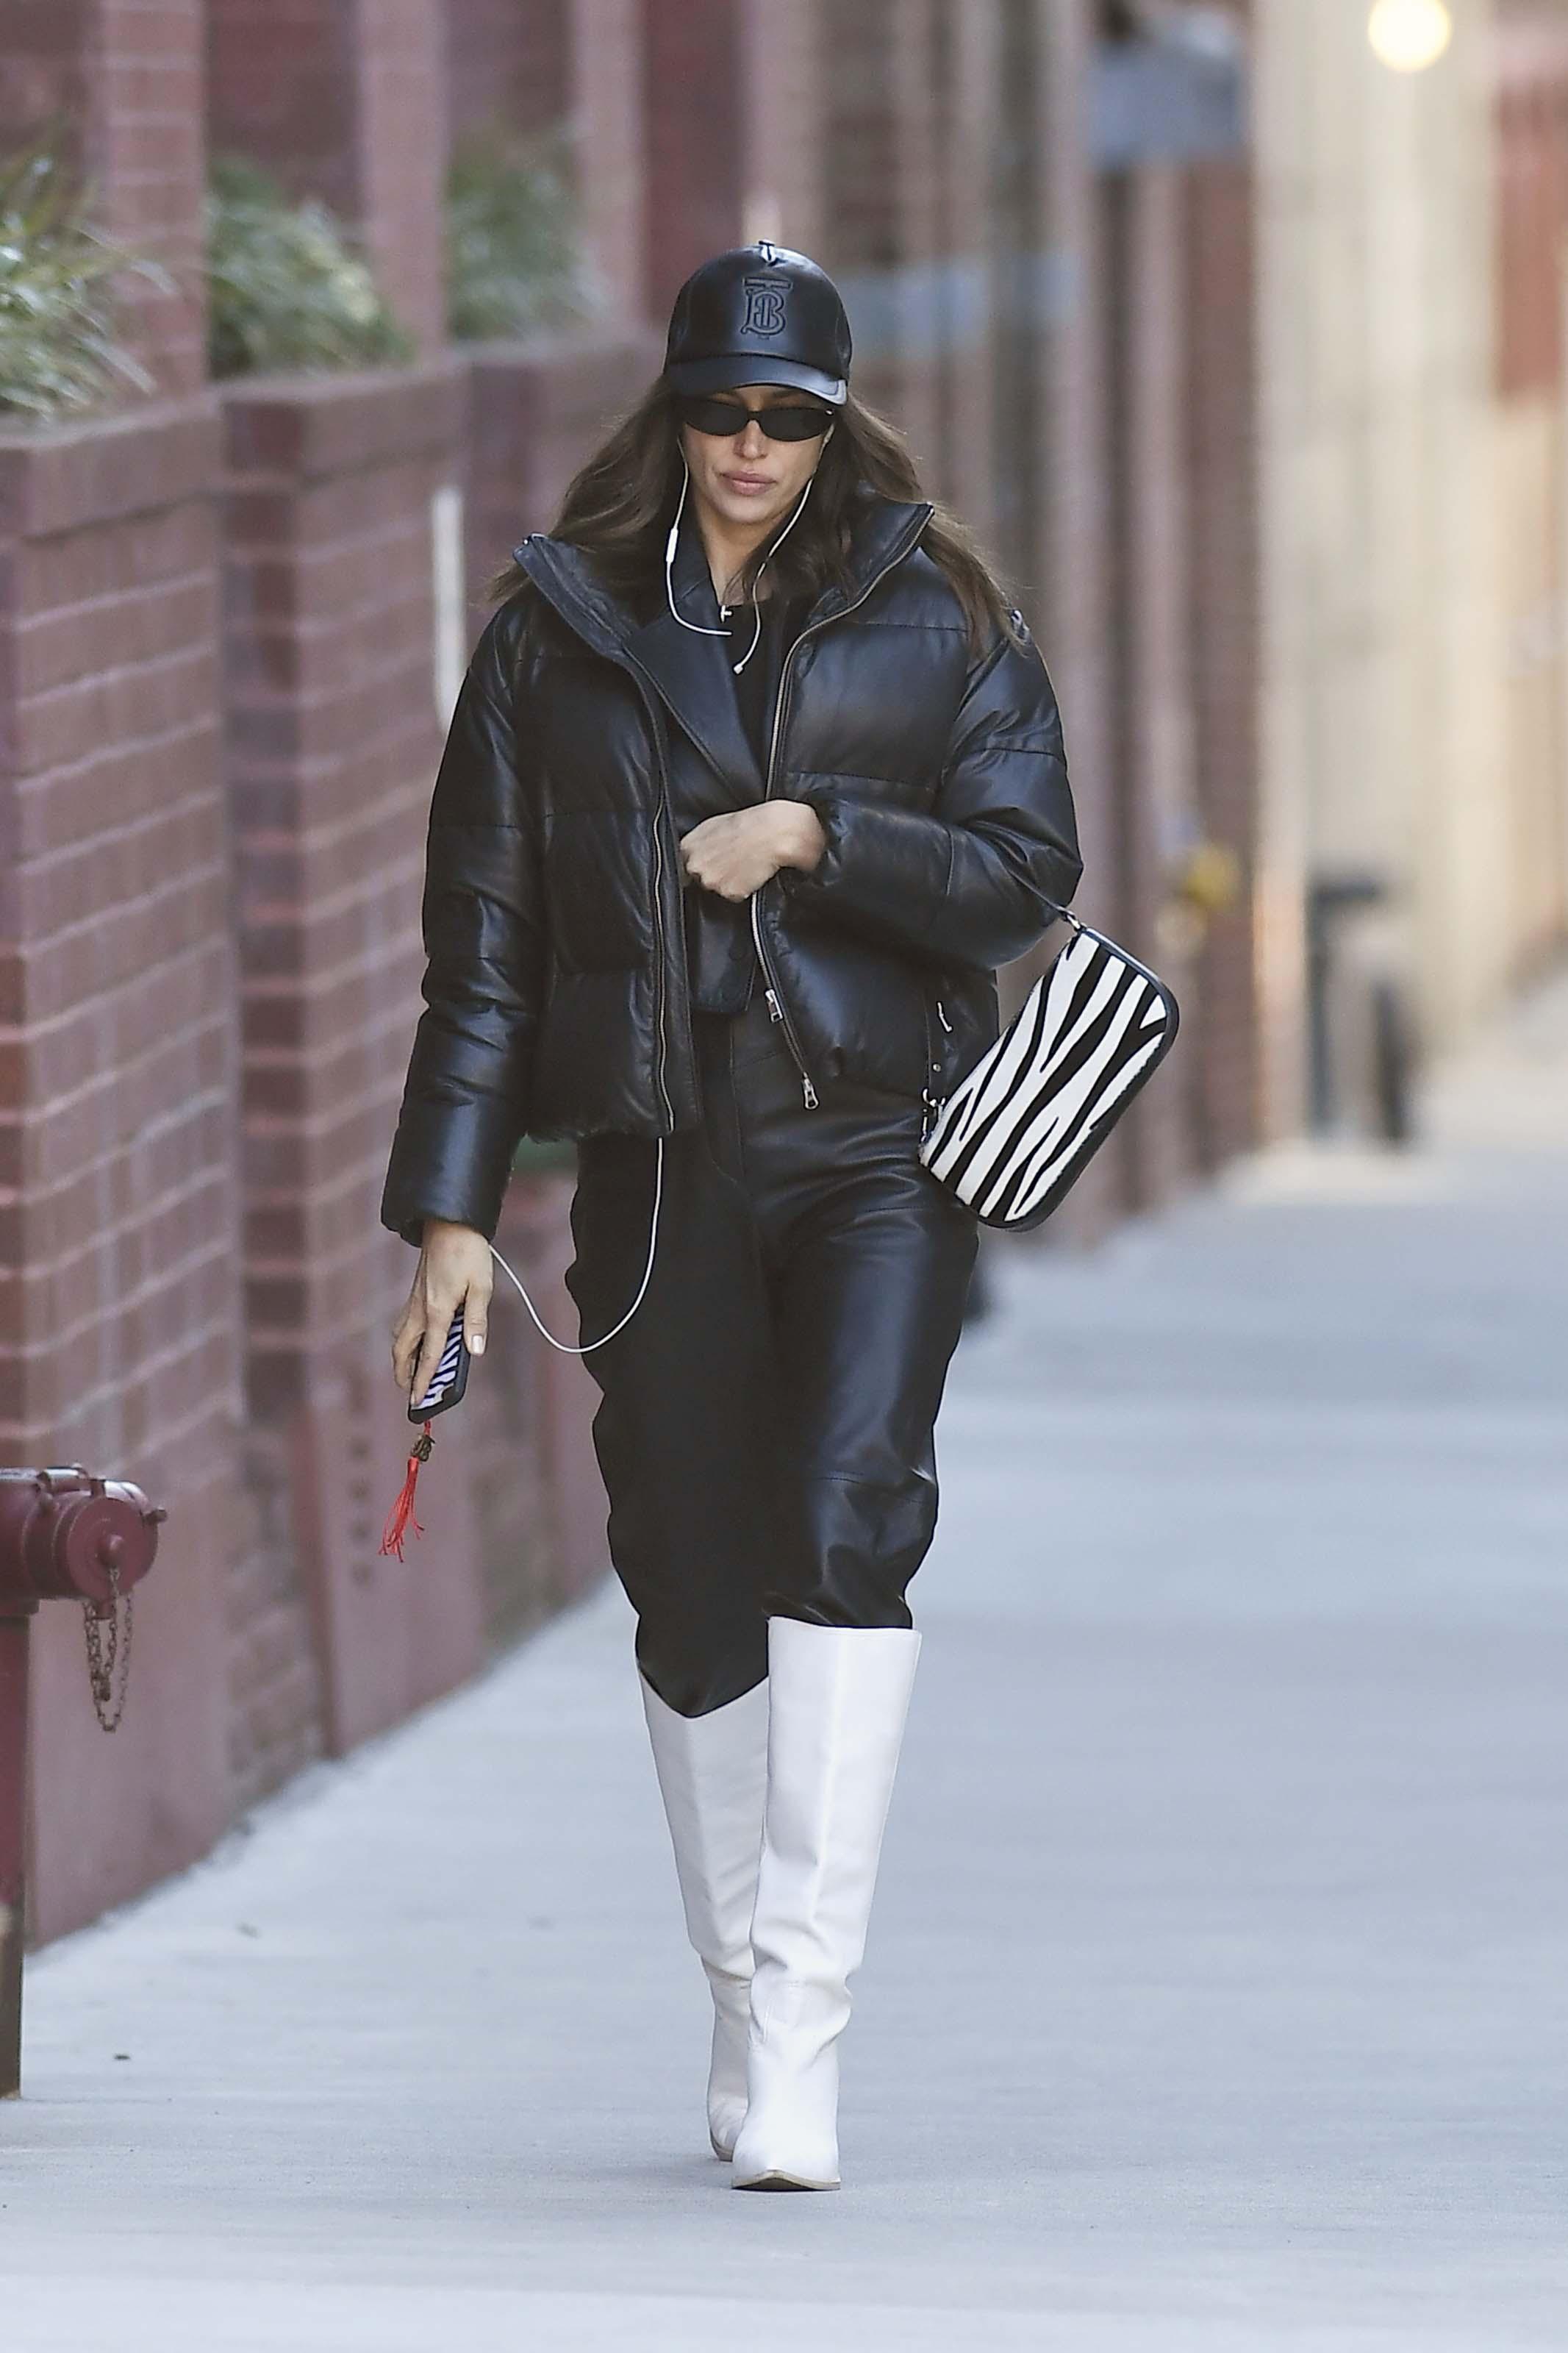 Irina Shayk heading Home After Doing Her Nails